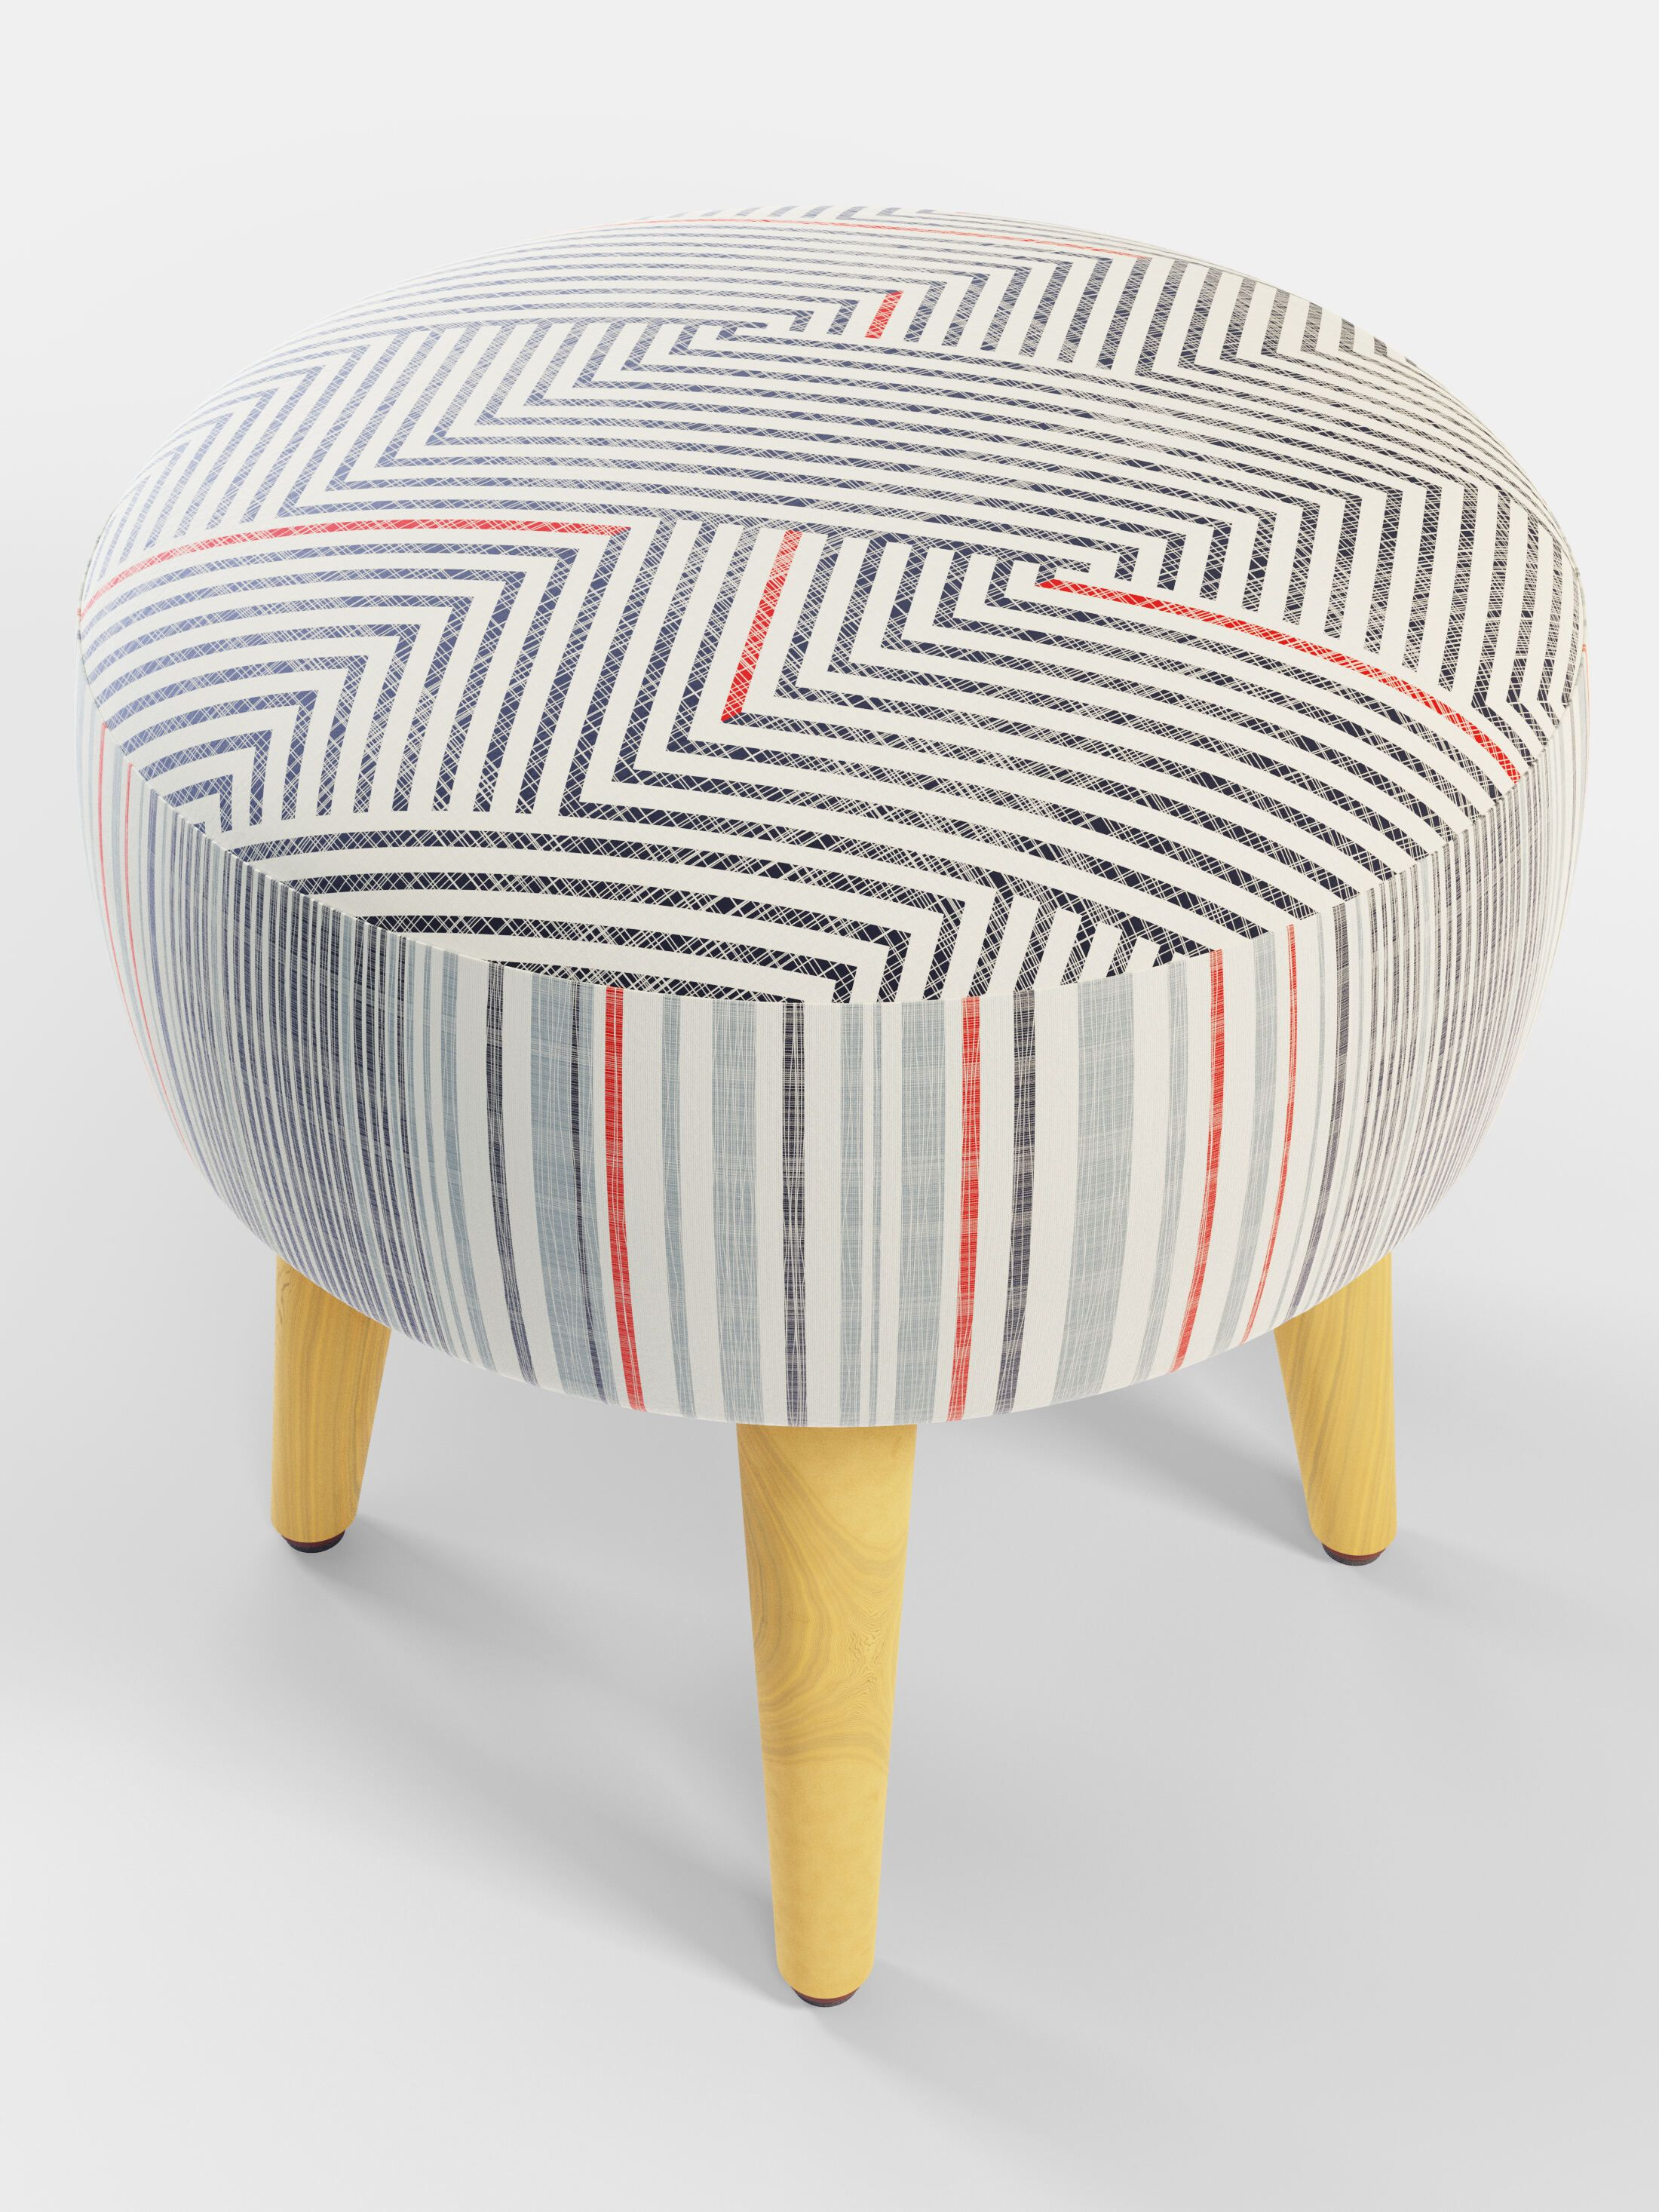 bespoke ottoman footstool circle shape